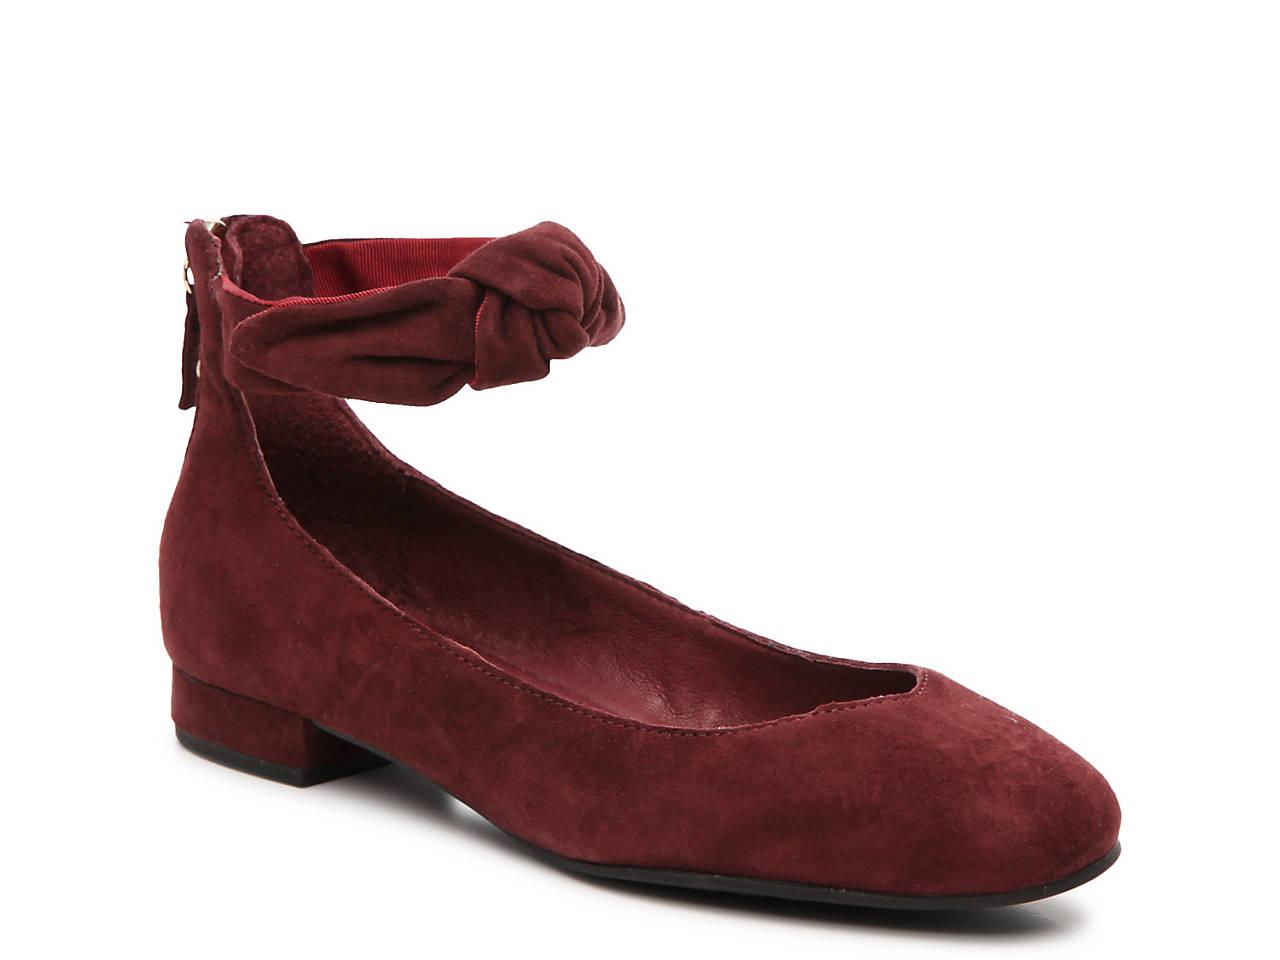 ONO Women's Hosta Ankle Bow Flat 1Q2EHlSwsH